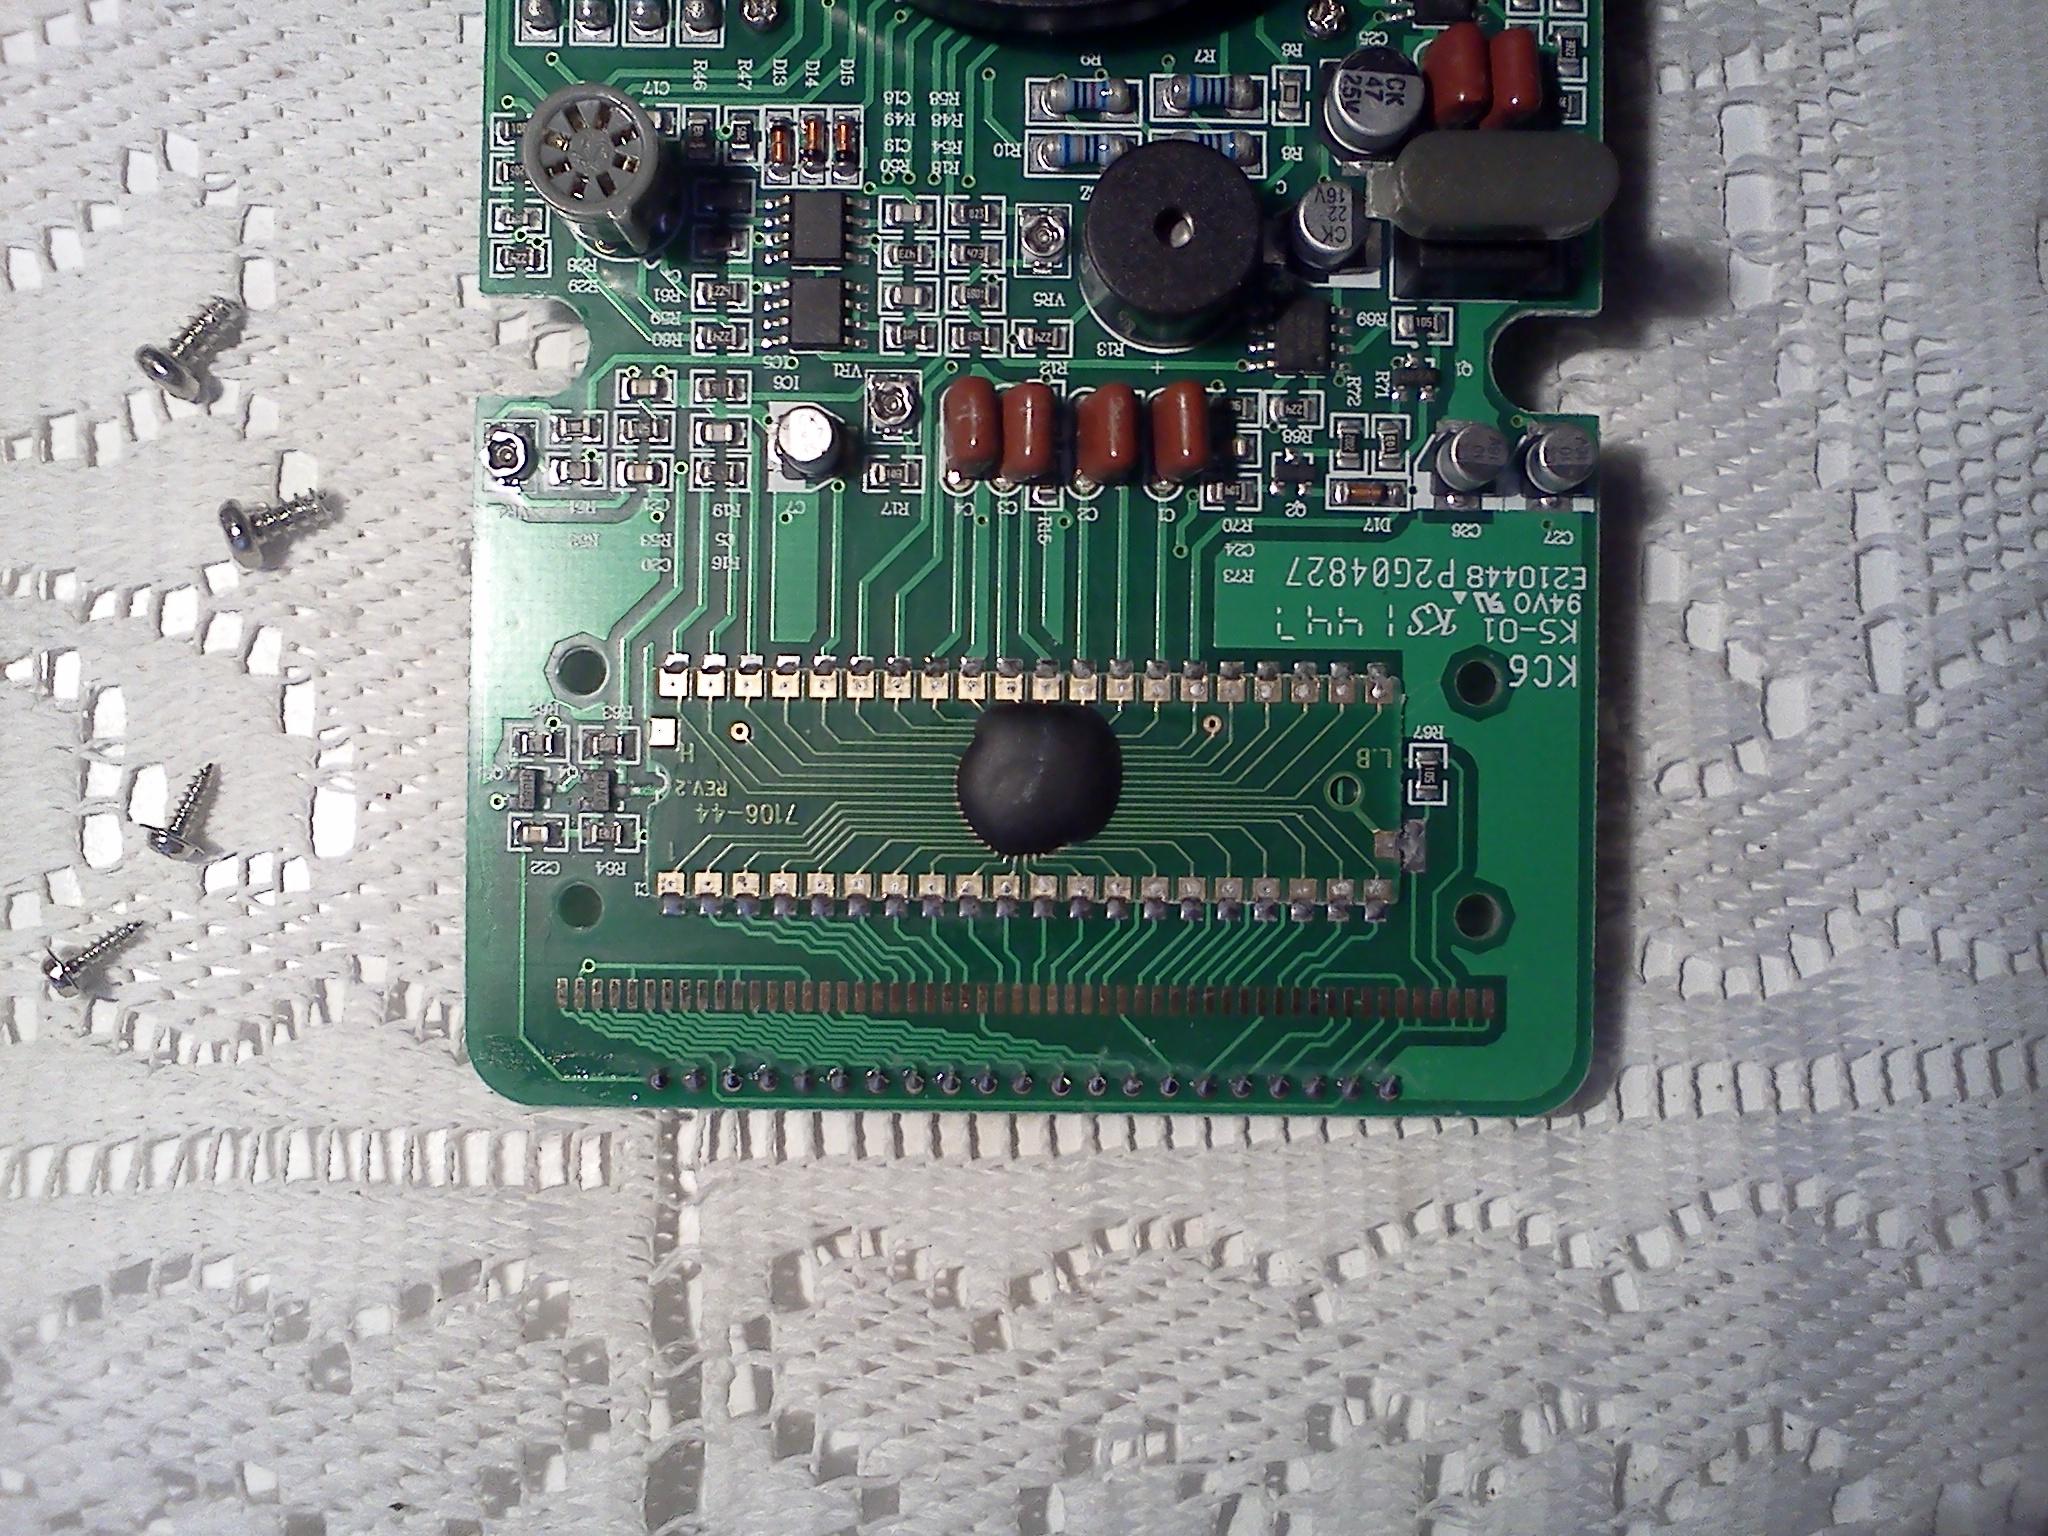 Kemot Kt890 Icl7106 Pinout Digital Voltmeter Circuit